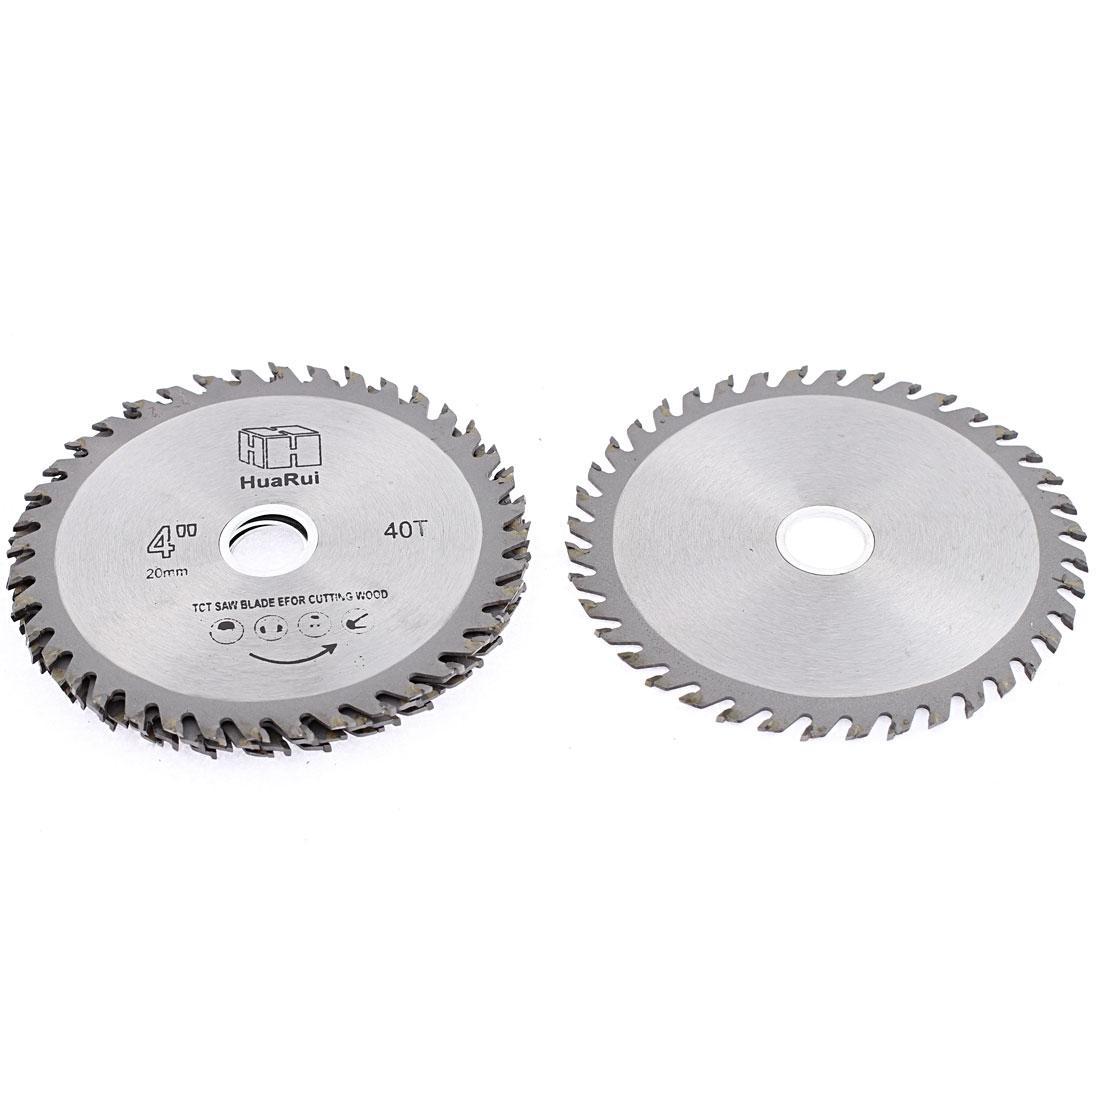 5 Pcs 110mmx20mmx1mm 40 Teeth Circular Cutting TCT Saw Cutter Hand Tool